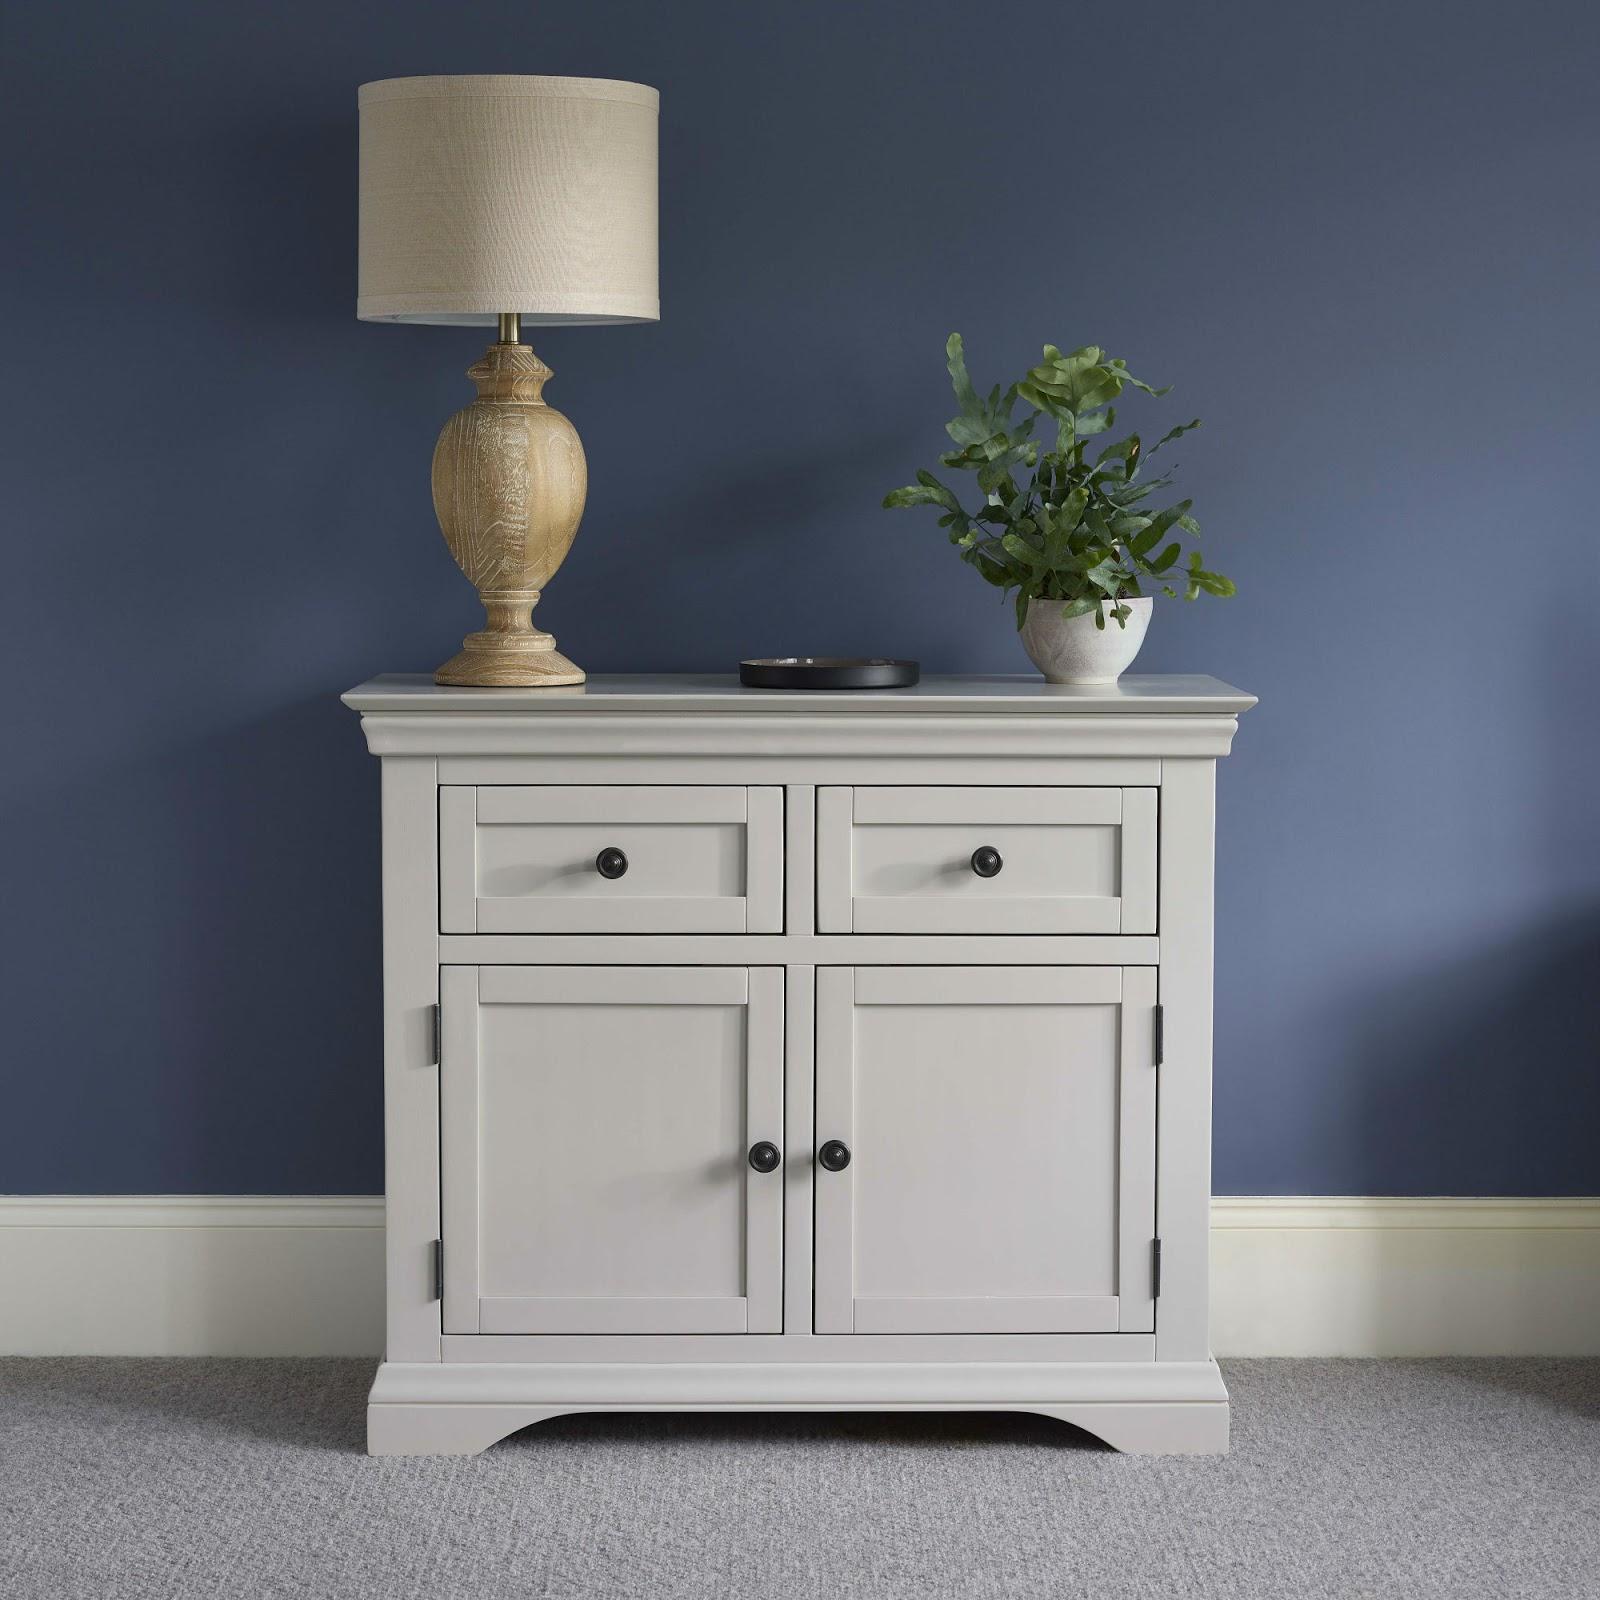 White Furniture and dark blue walls